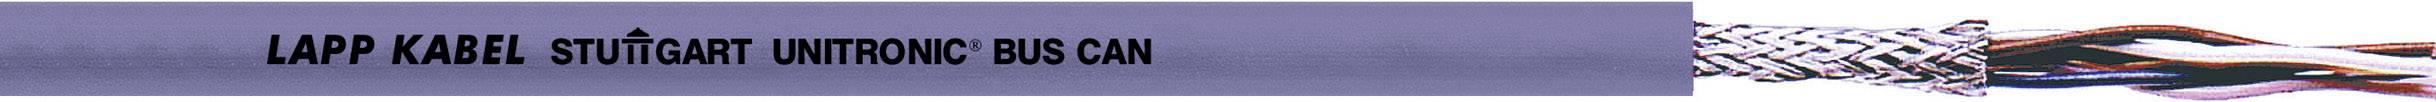 Sběrnicový kabel LappKabel BUS CAN (2170260), 120 Ω